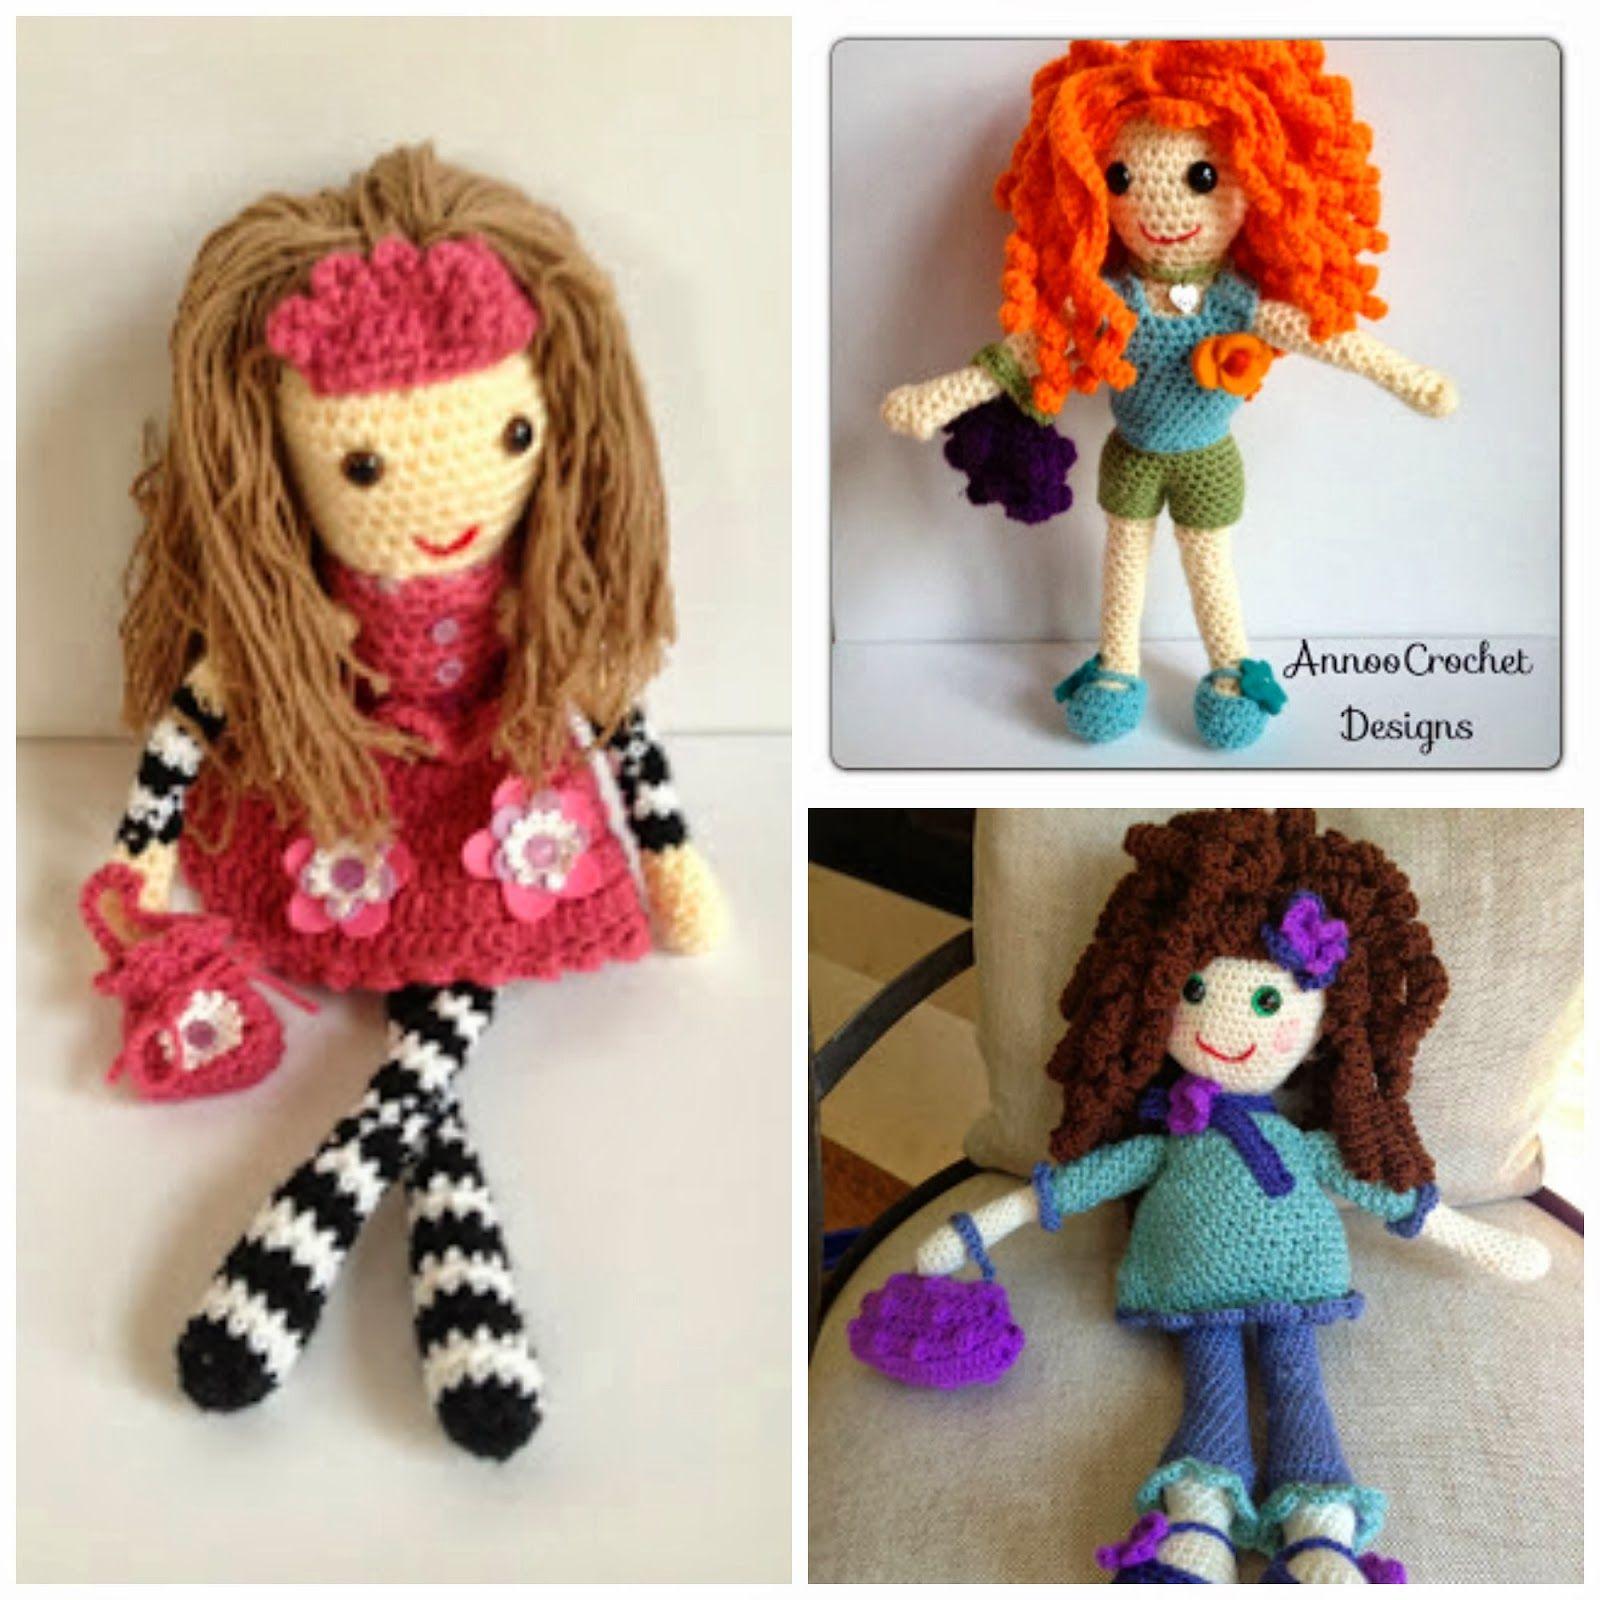 20+ FREE Crochet Doll Patterns (Free Crochet Patterns and Tutorials ...